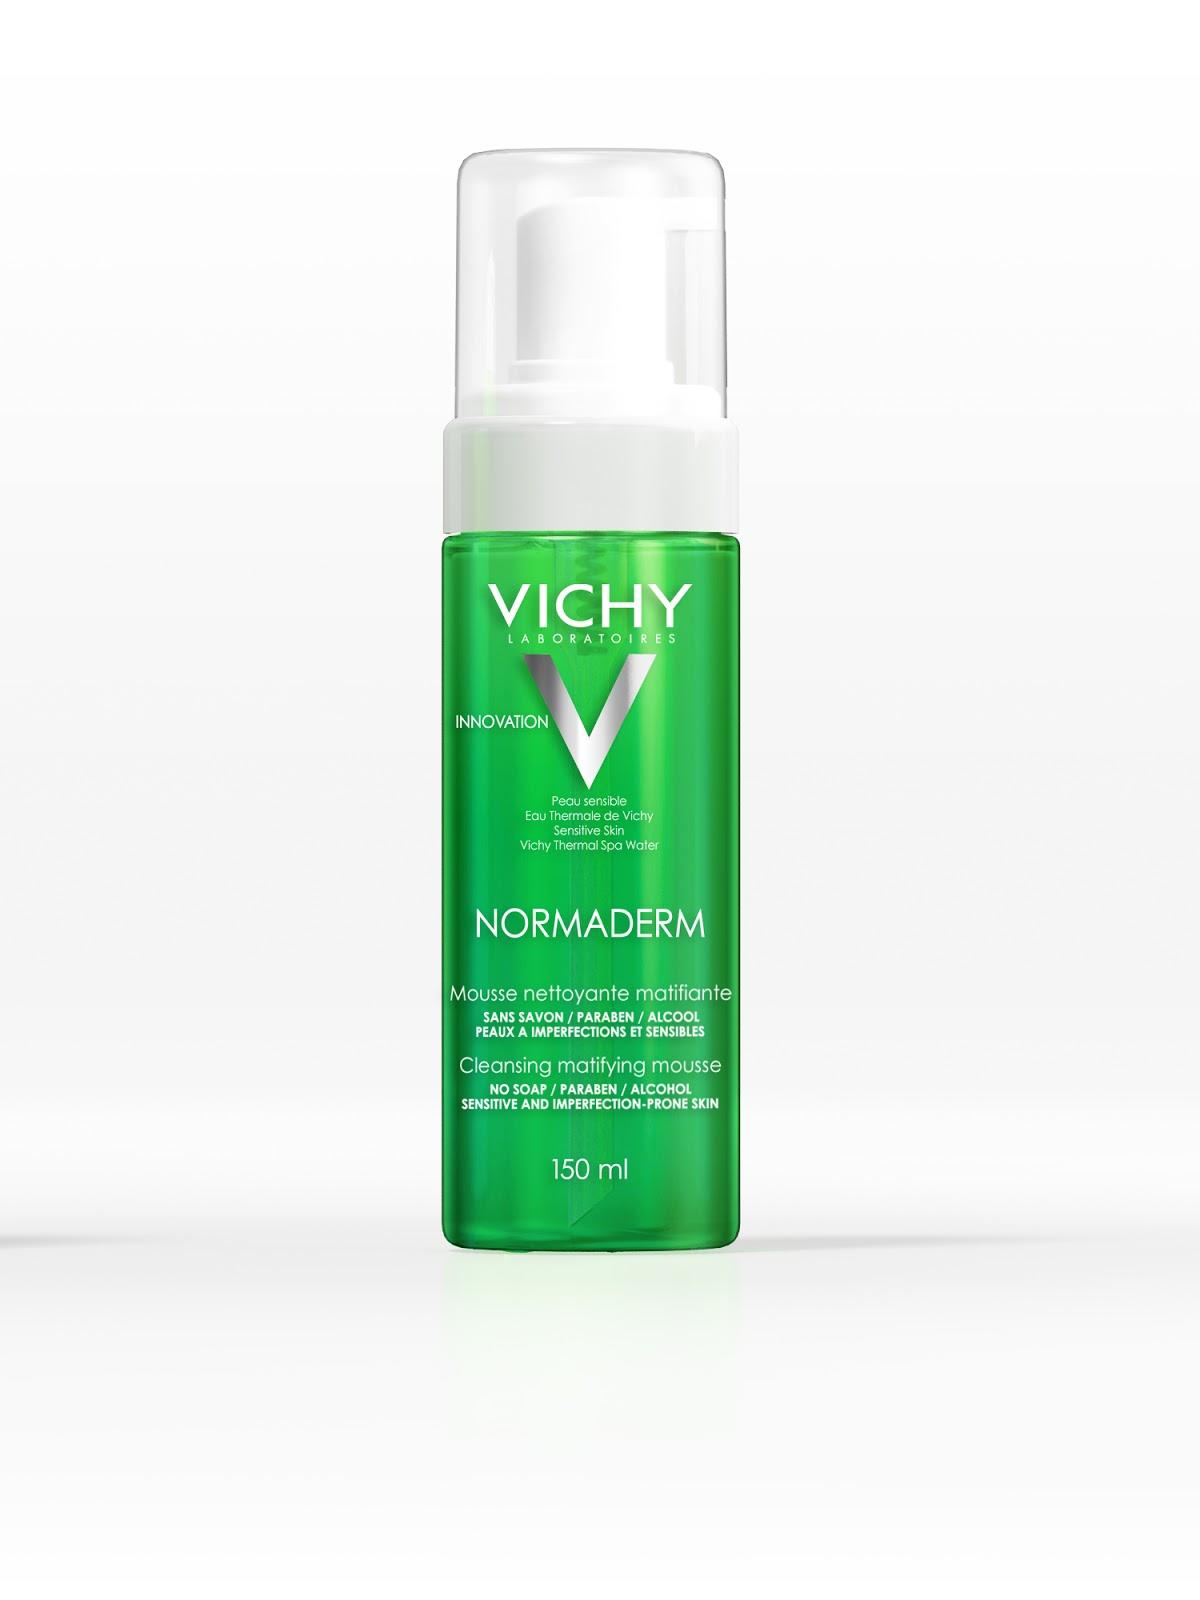 Vichy Normadem